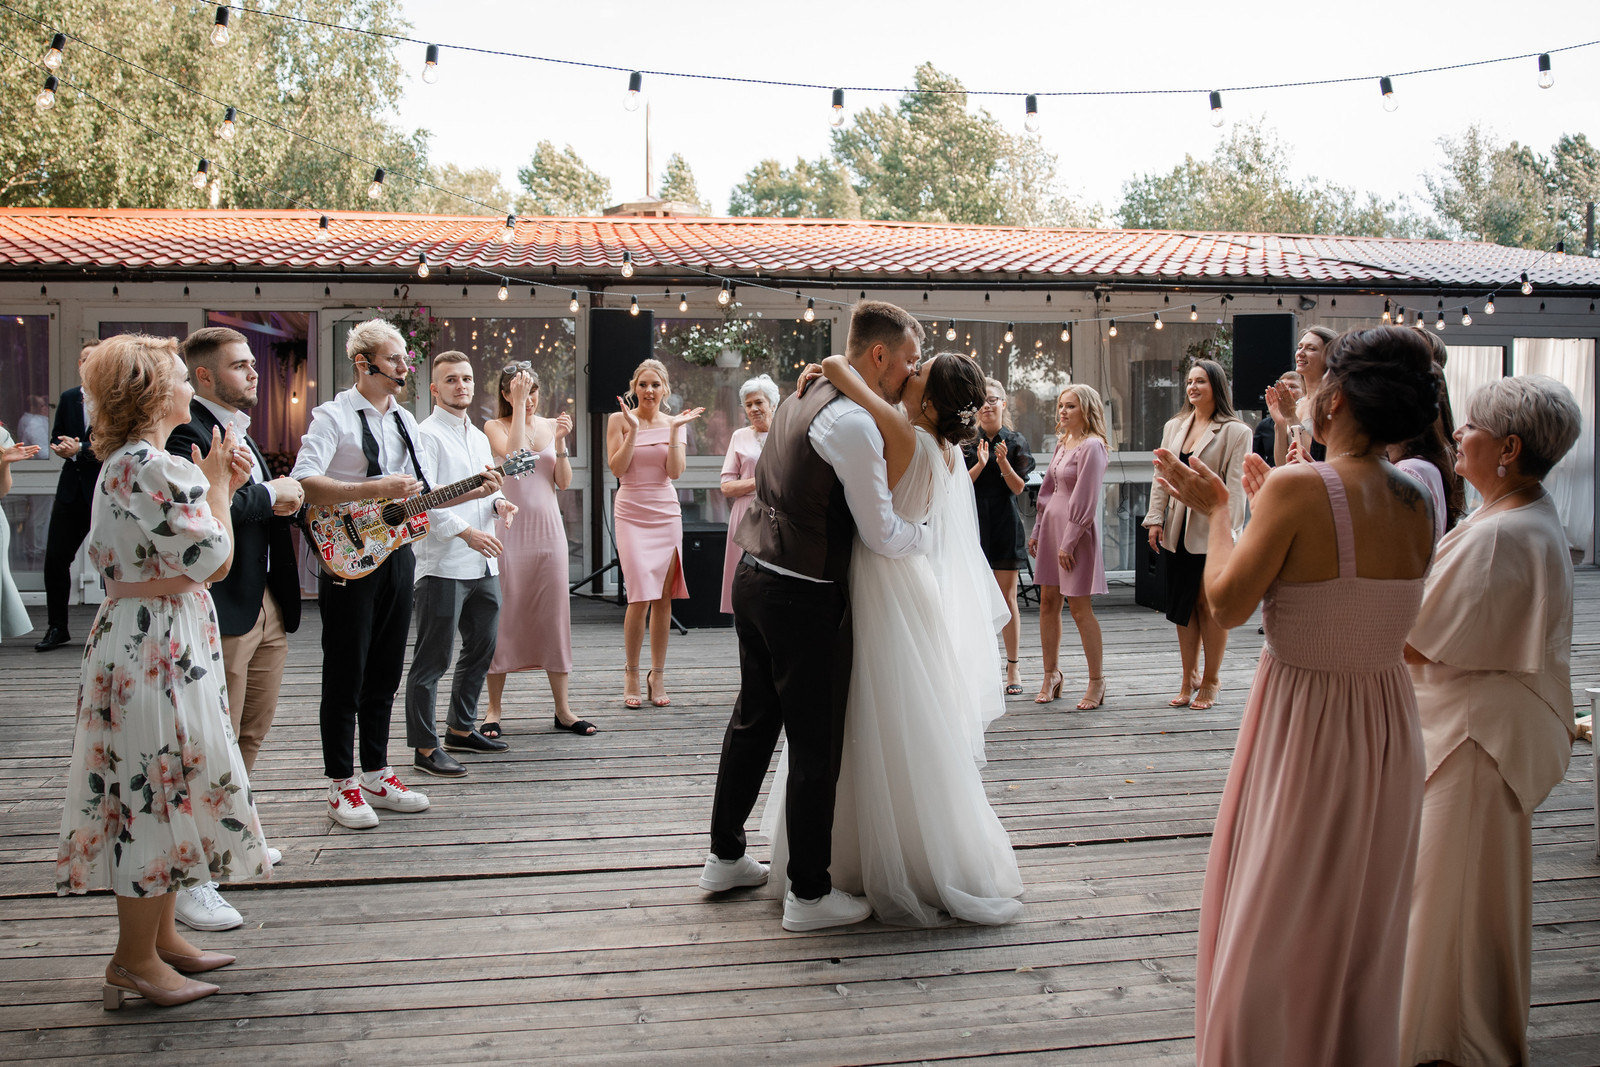 Relaxed atmosphere: лаконичная свадьба